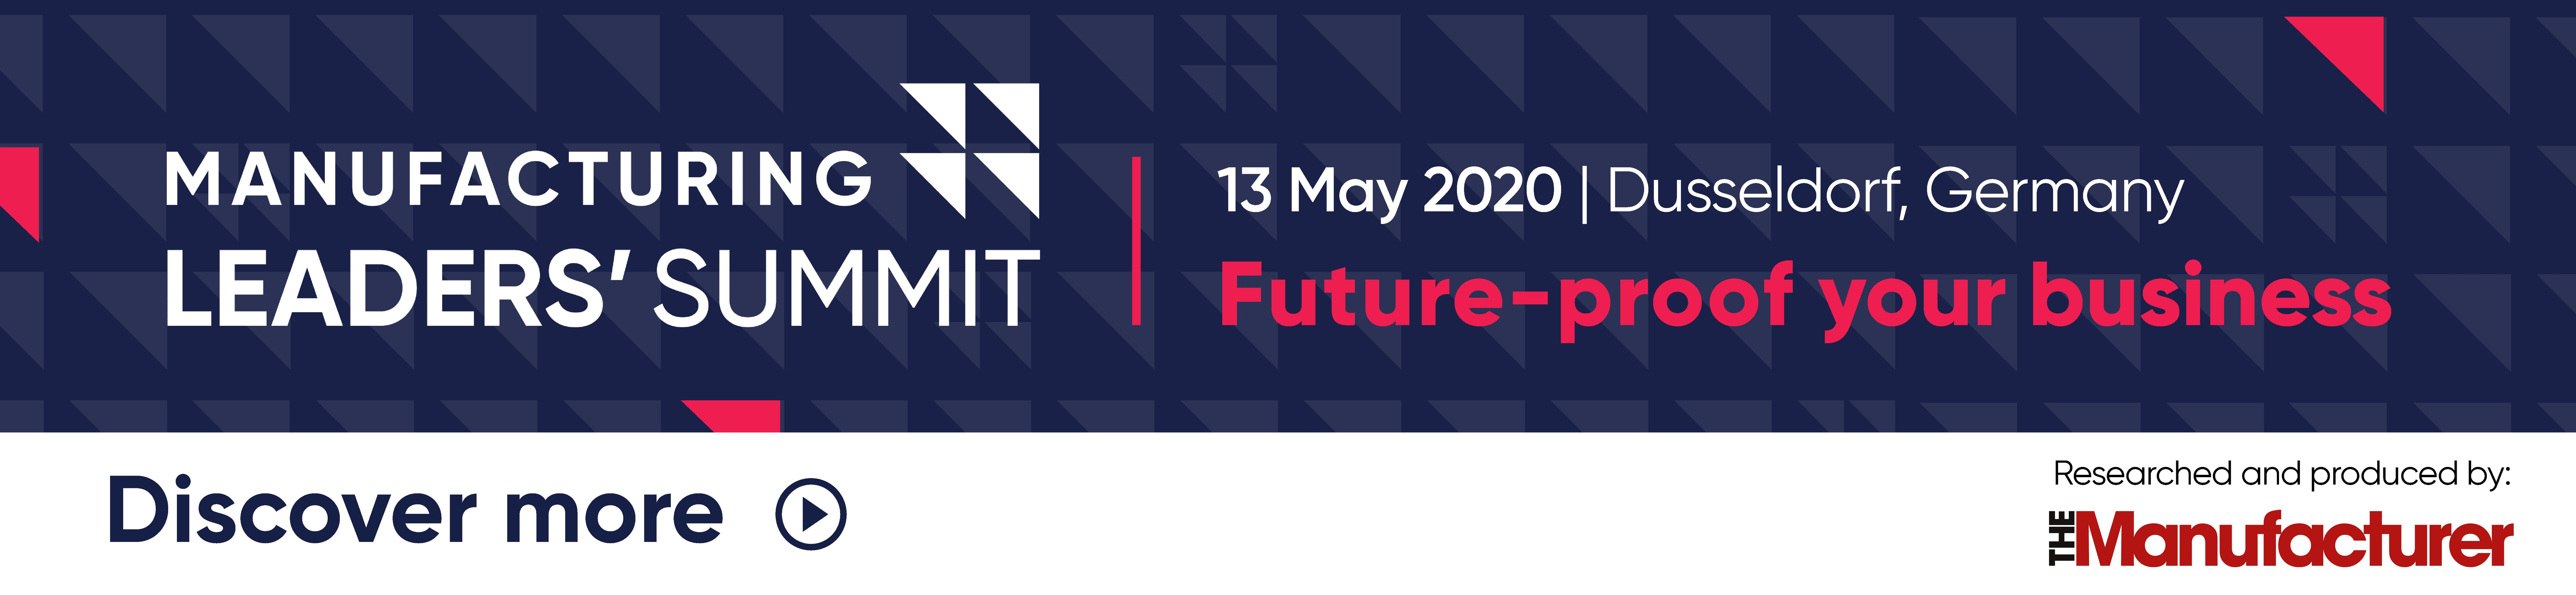 Manufacturing Leaders' Summit EU 2020 Banner